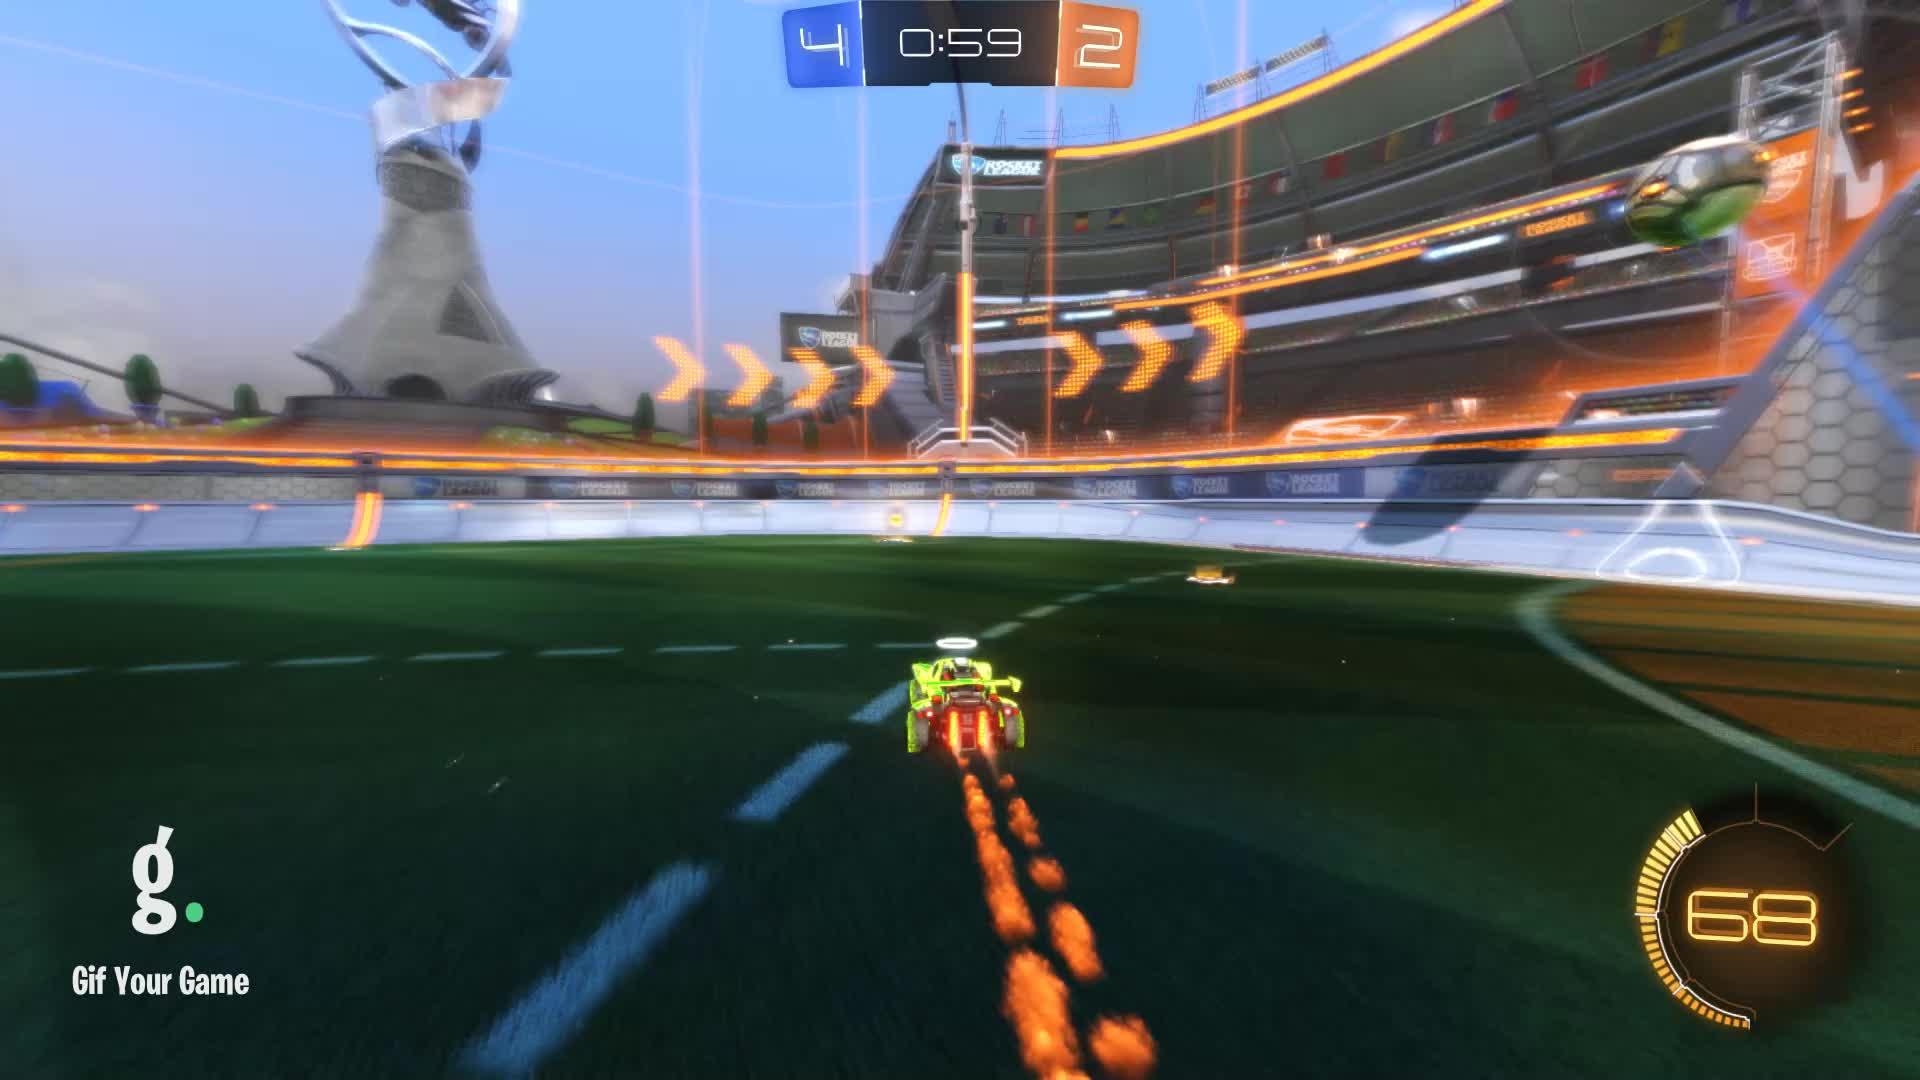 Gif Your Game, GifYourGame, Goal, Rocket League, RocketLeague, Zoar, Goal 7: Zoar GIFs